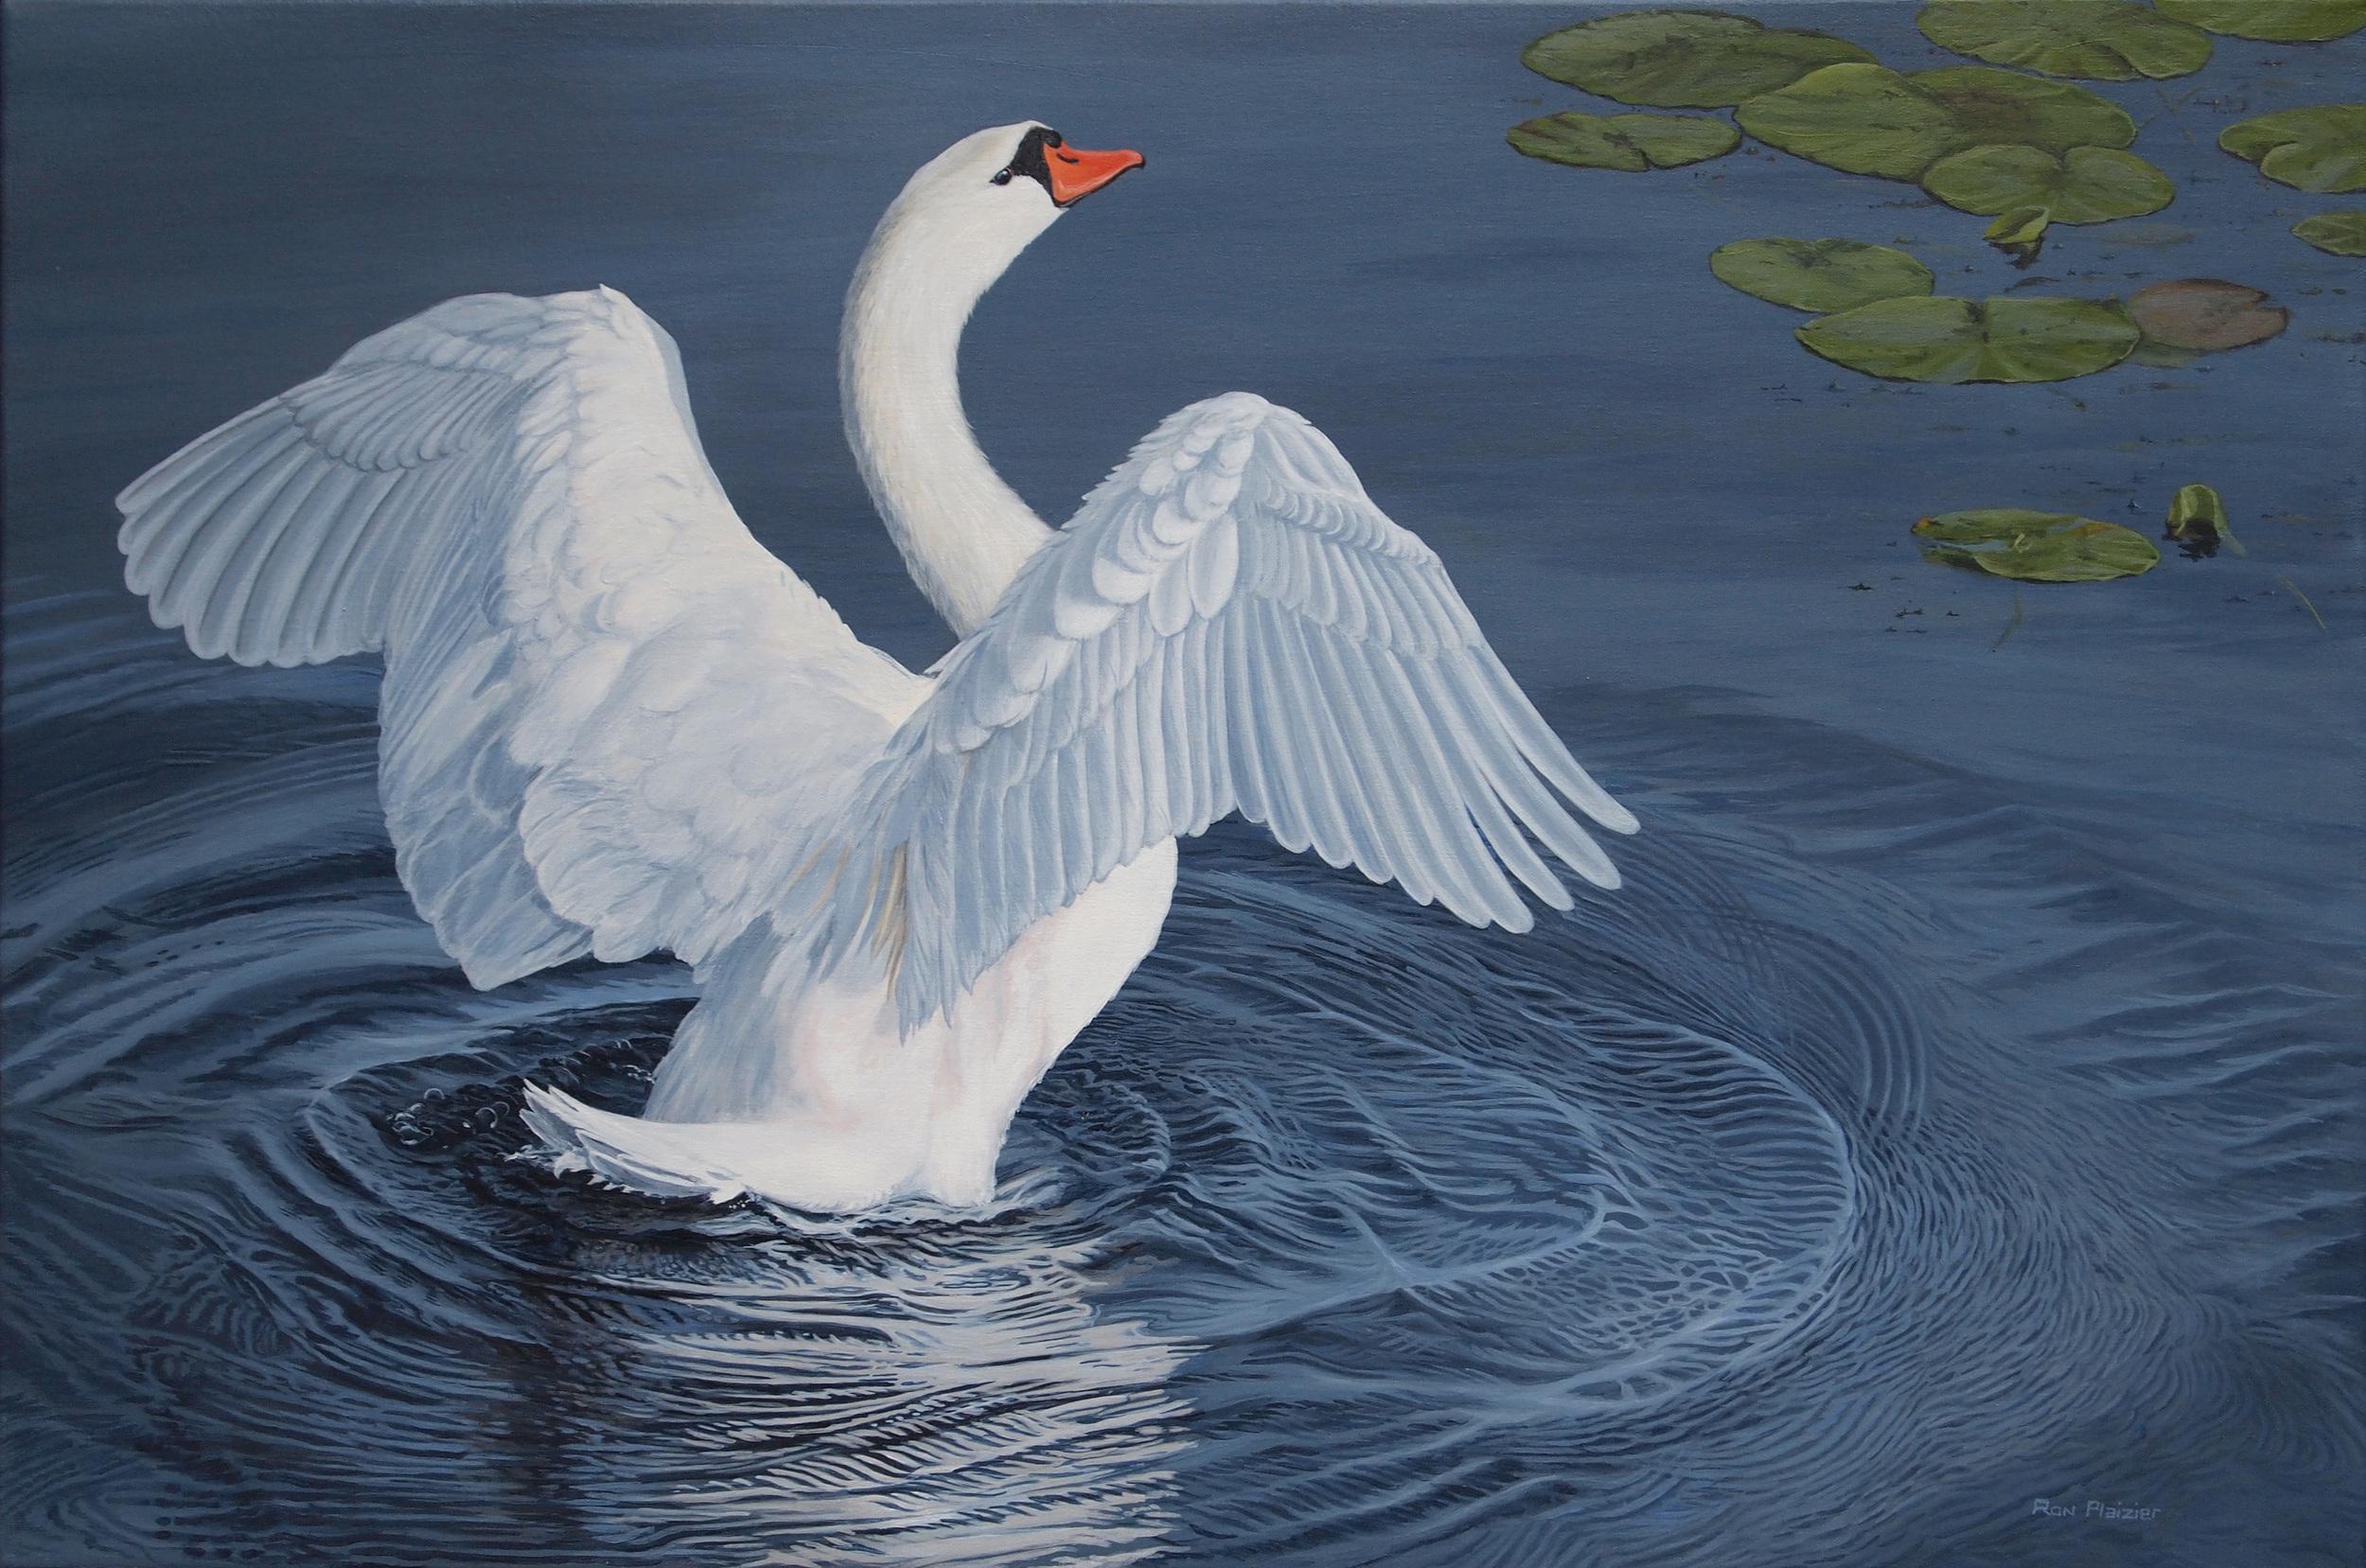 Water Dancer - Mute Swan